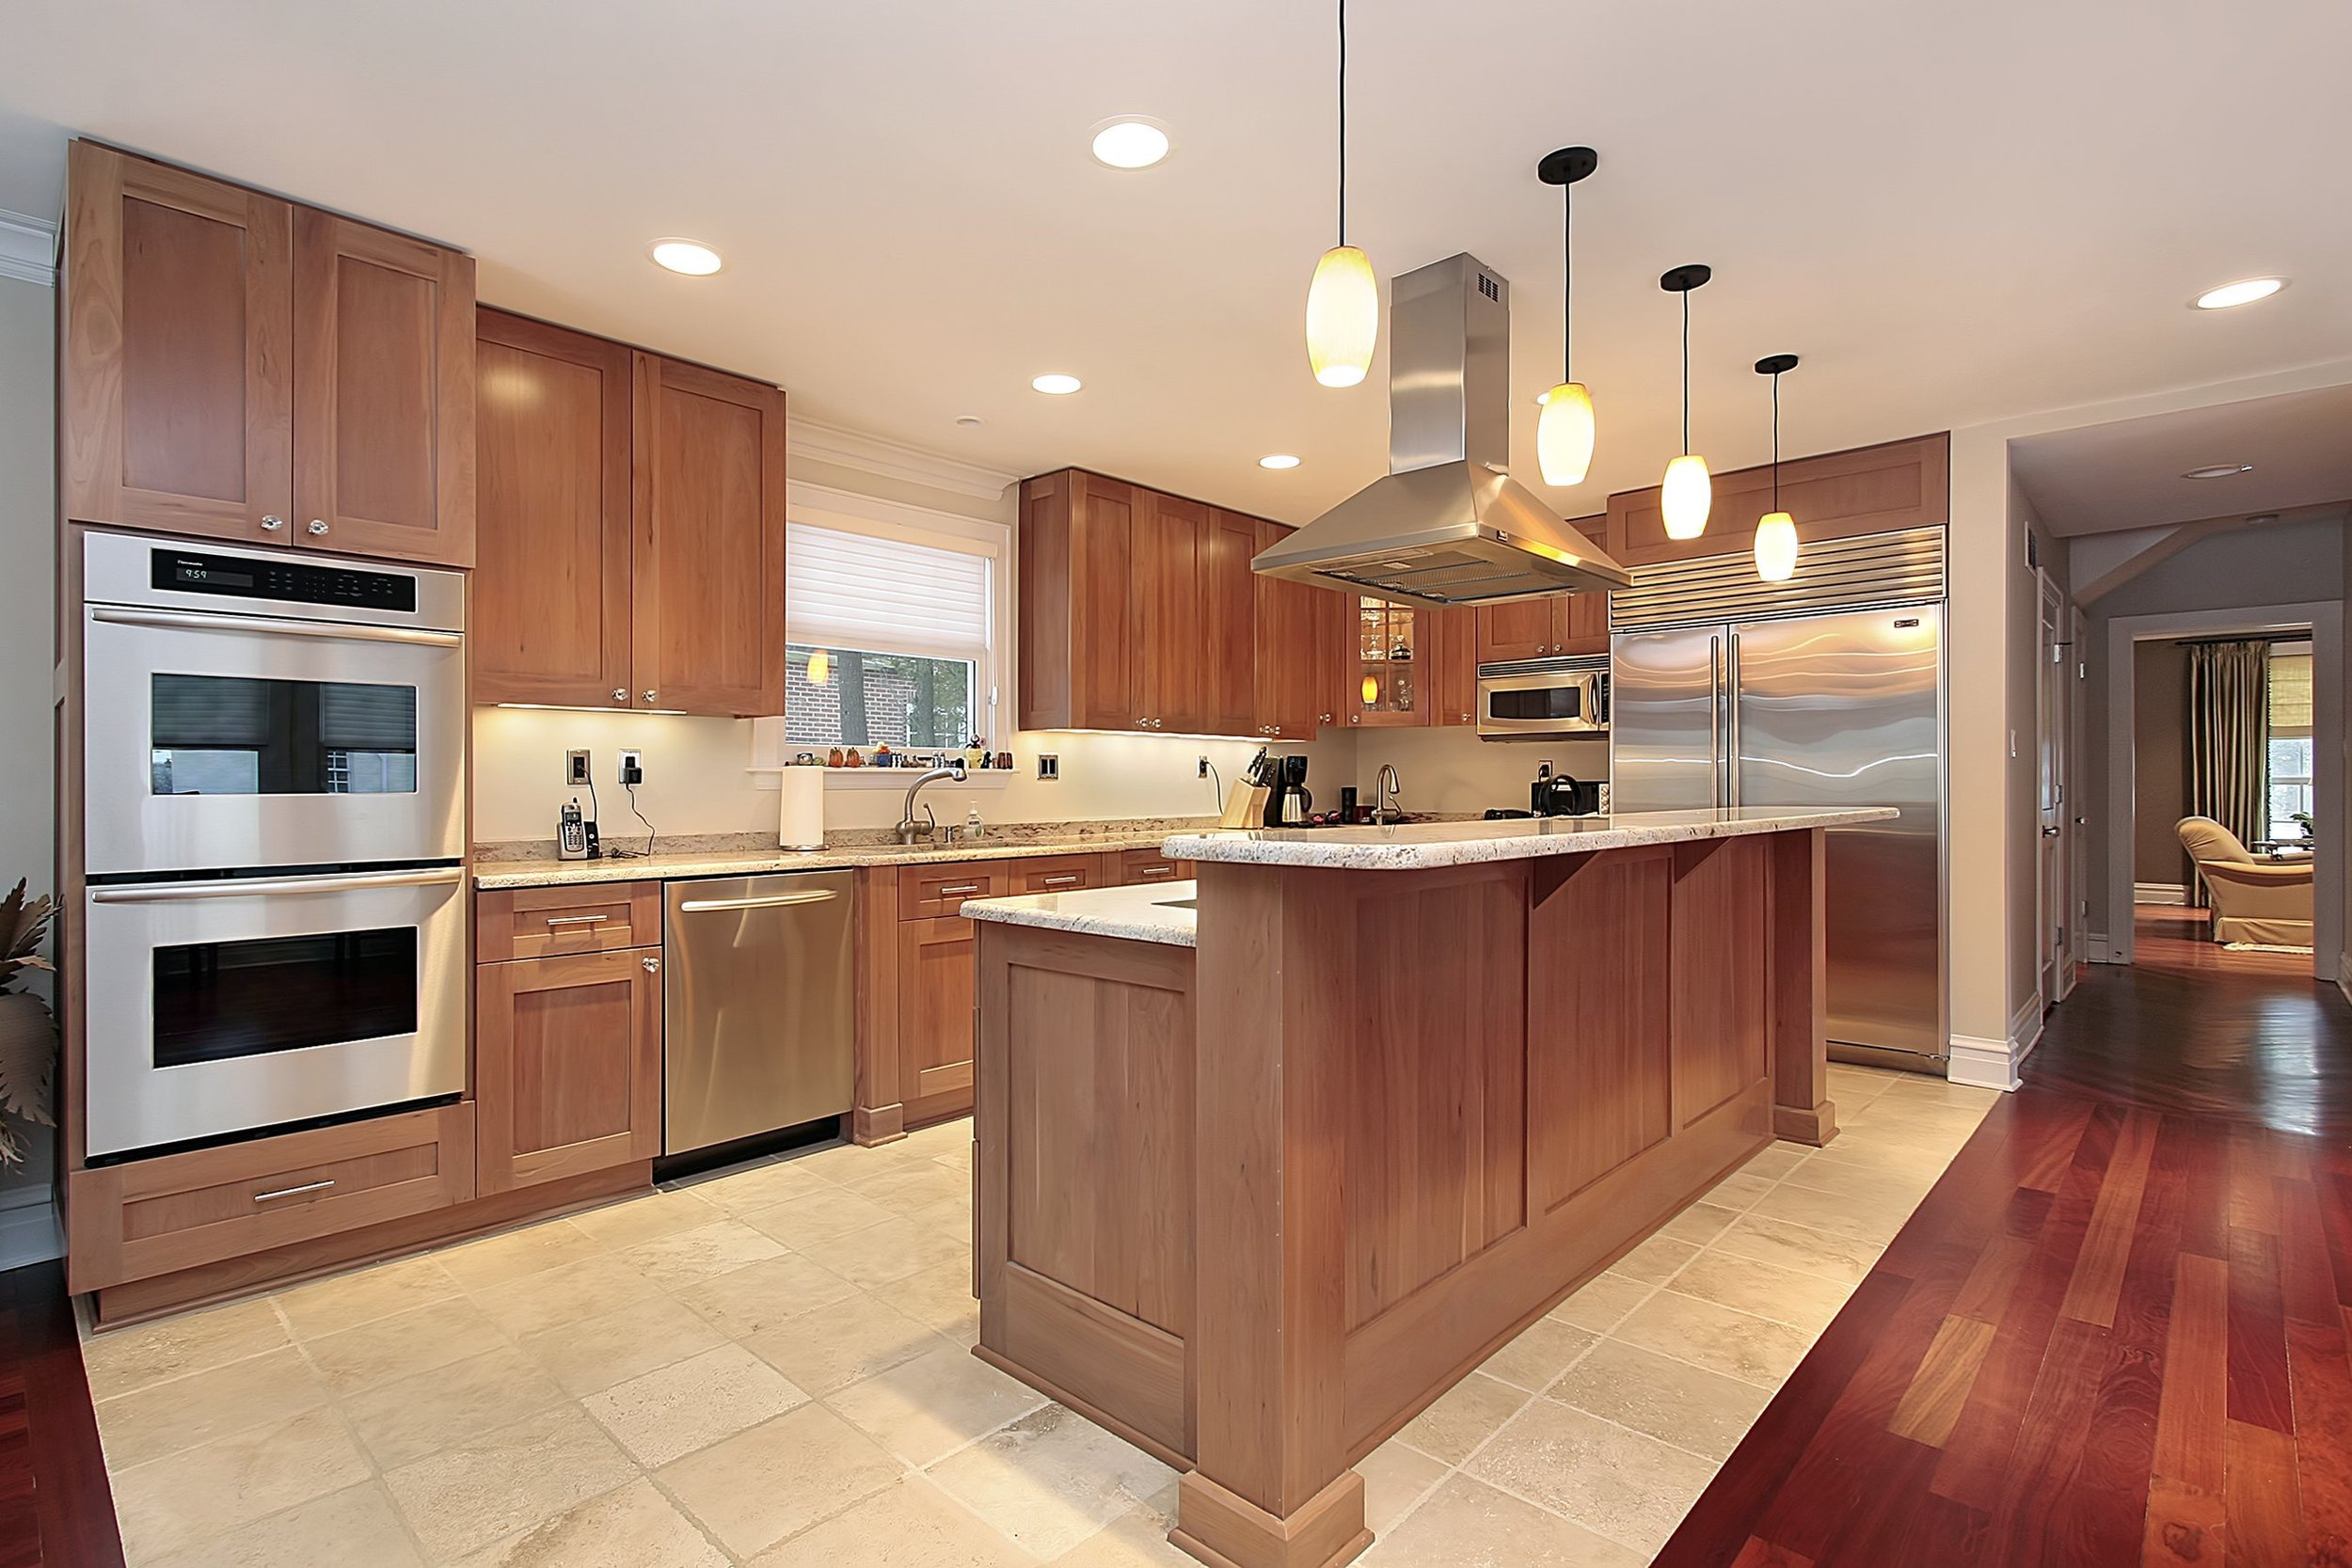 Kitchen-With2TierIsland+DoubleOven-shutterstock_43891282.jpg